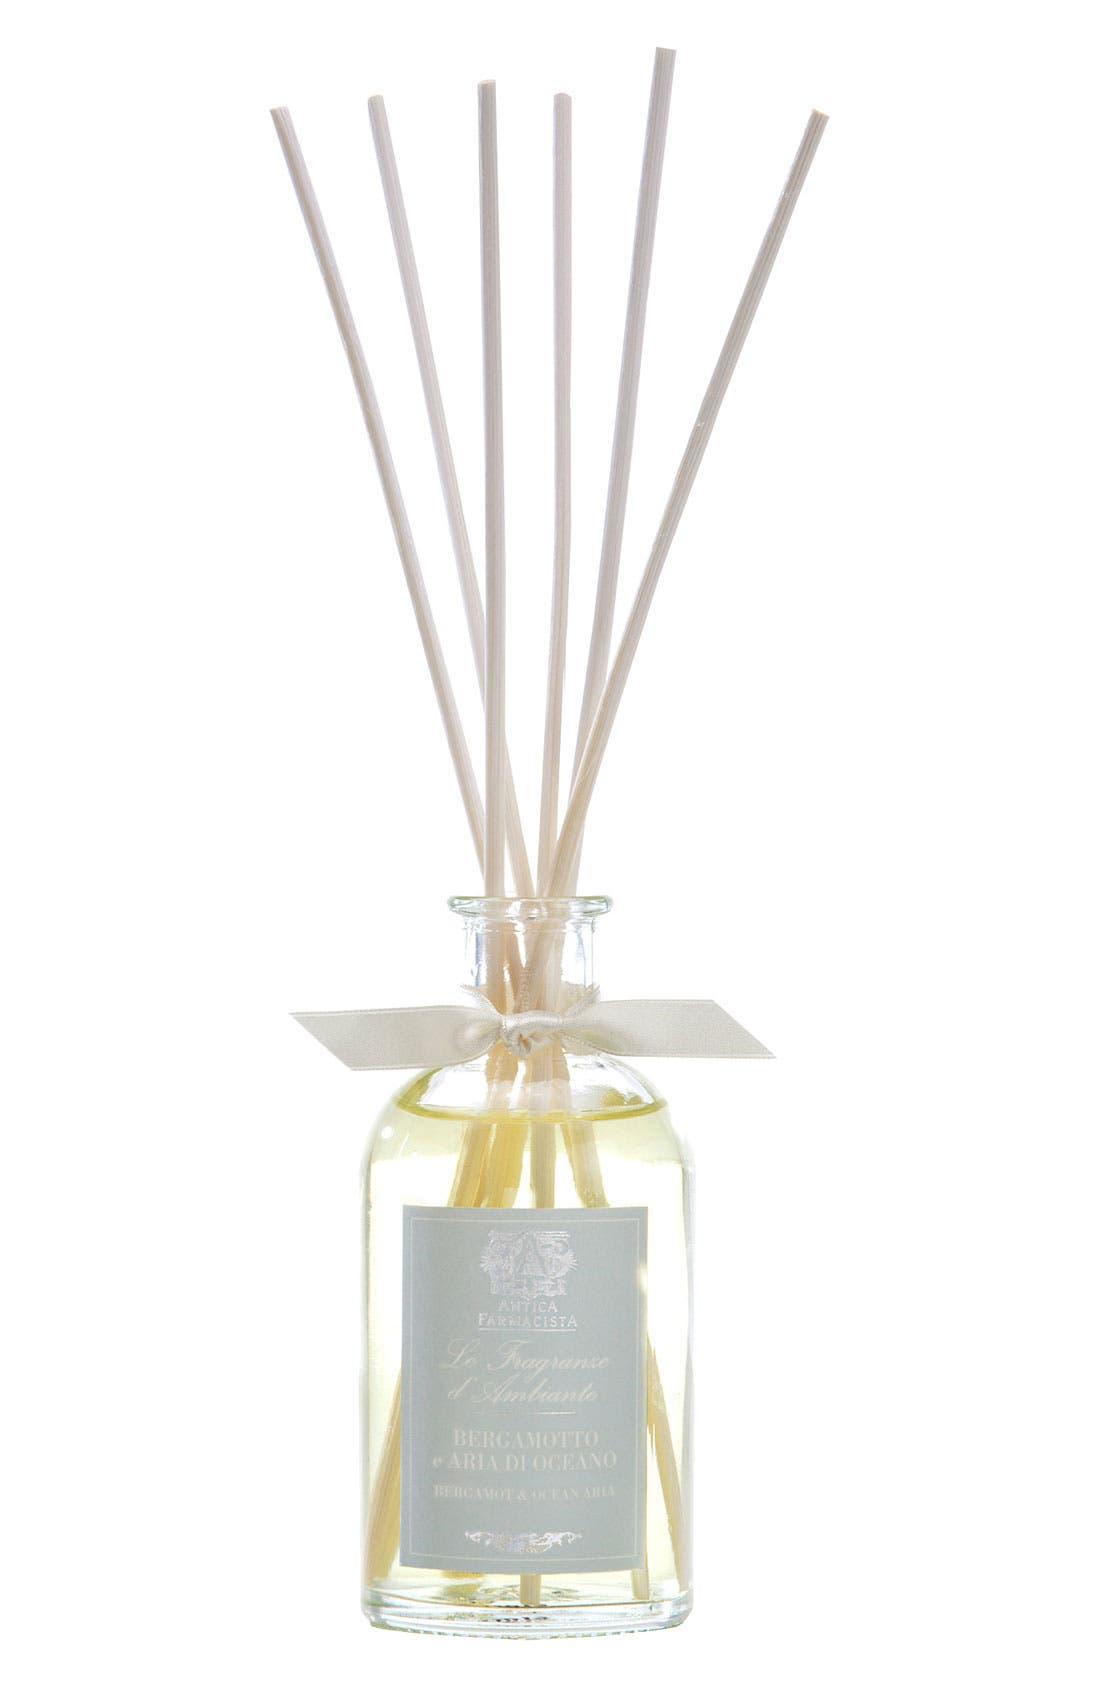 Antica Farmacista 'Bergamot & Ocean Aria' Home Ambiance Perfume (3.3 oz.)